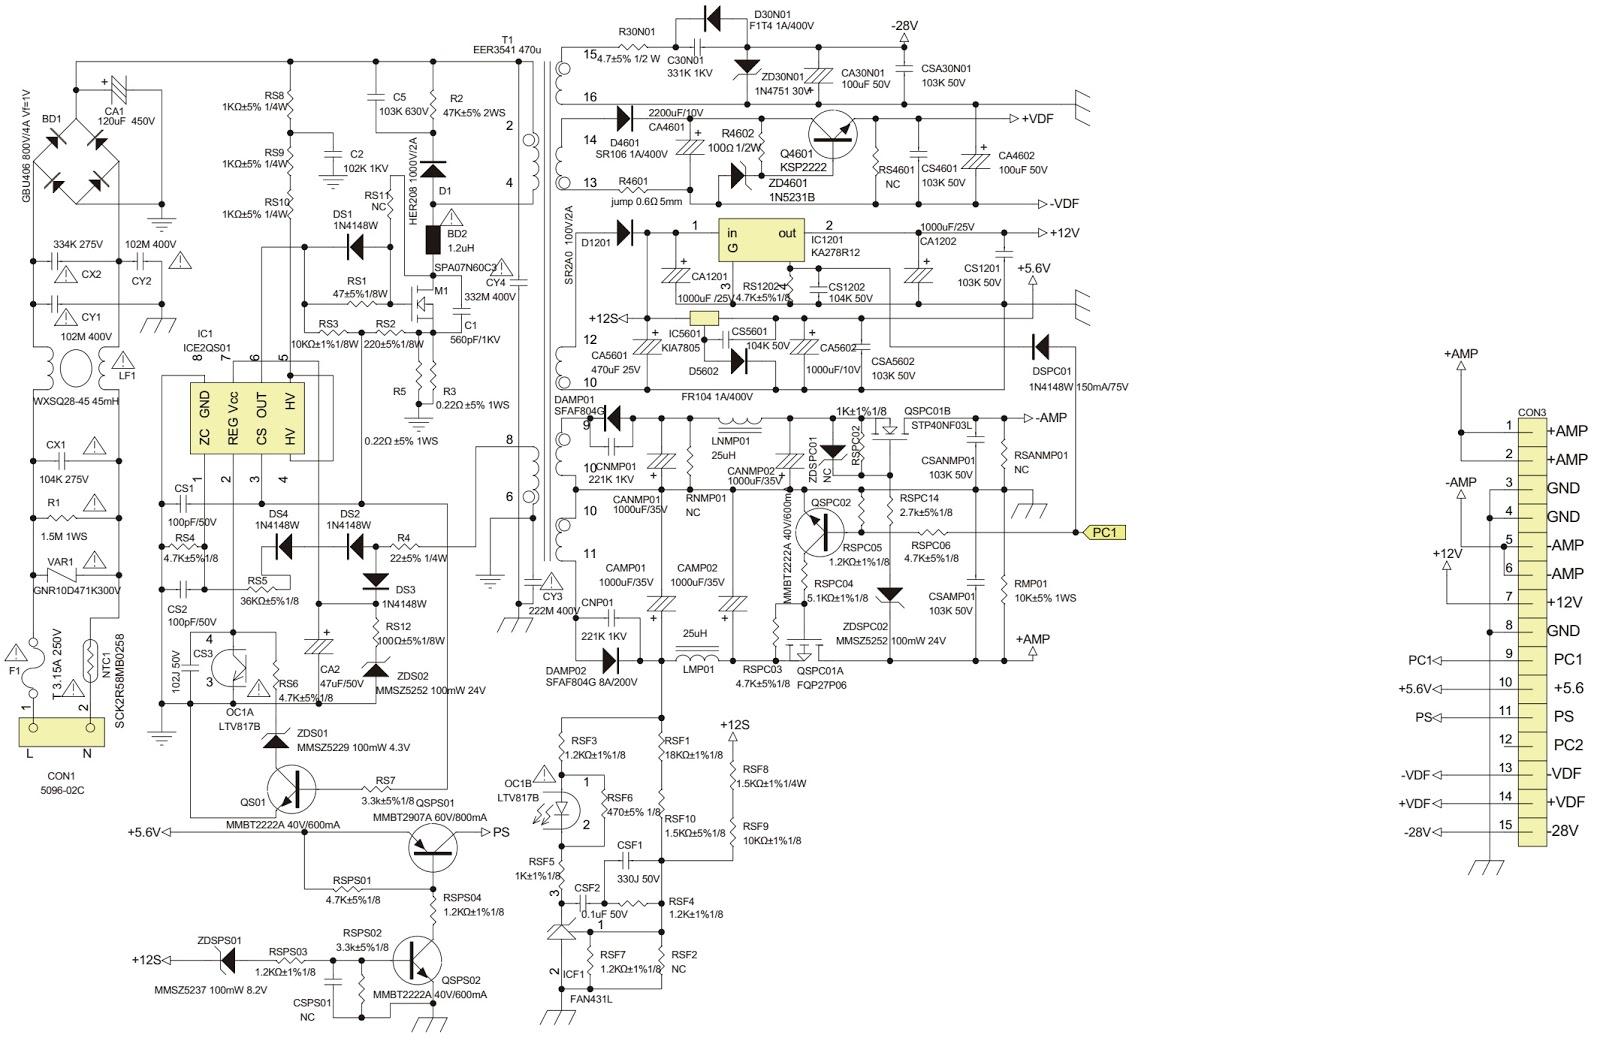 3 5 mm to xlr wiring diagram 2003 chevy malibu engine 5mm female audio jack imageresizertool com